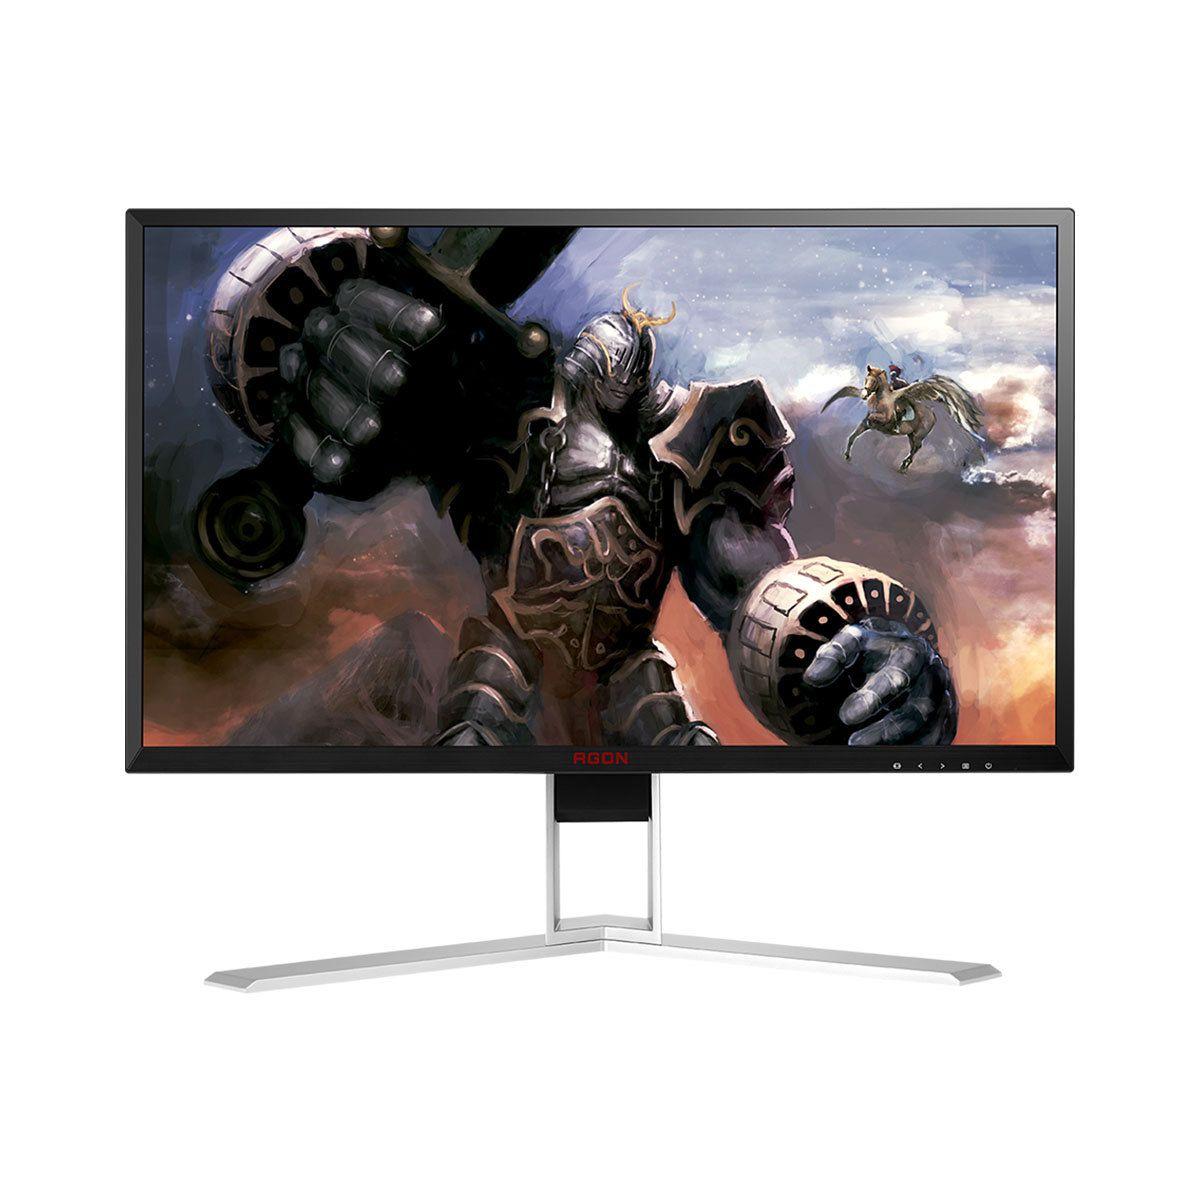 Monitor Gamer 24,5 Full HD, HDMI/Display Port/DVI 240Hz 0.5ms Altura Ajustável AG251FZ2 - AOC